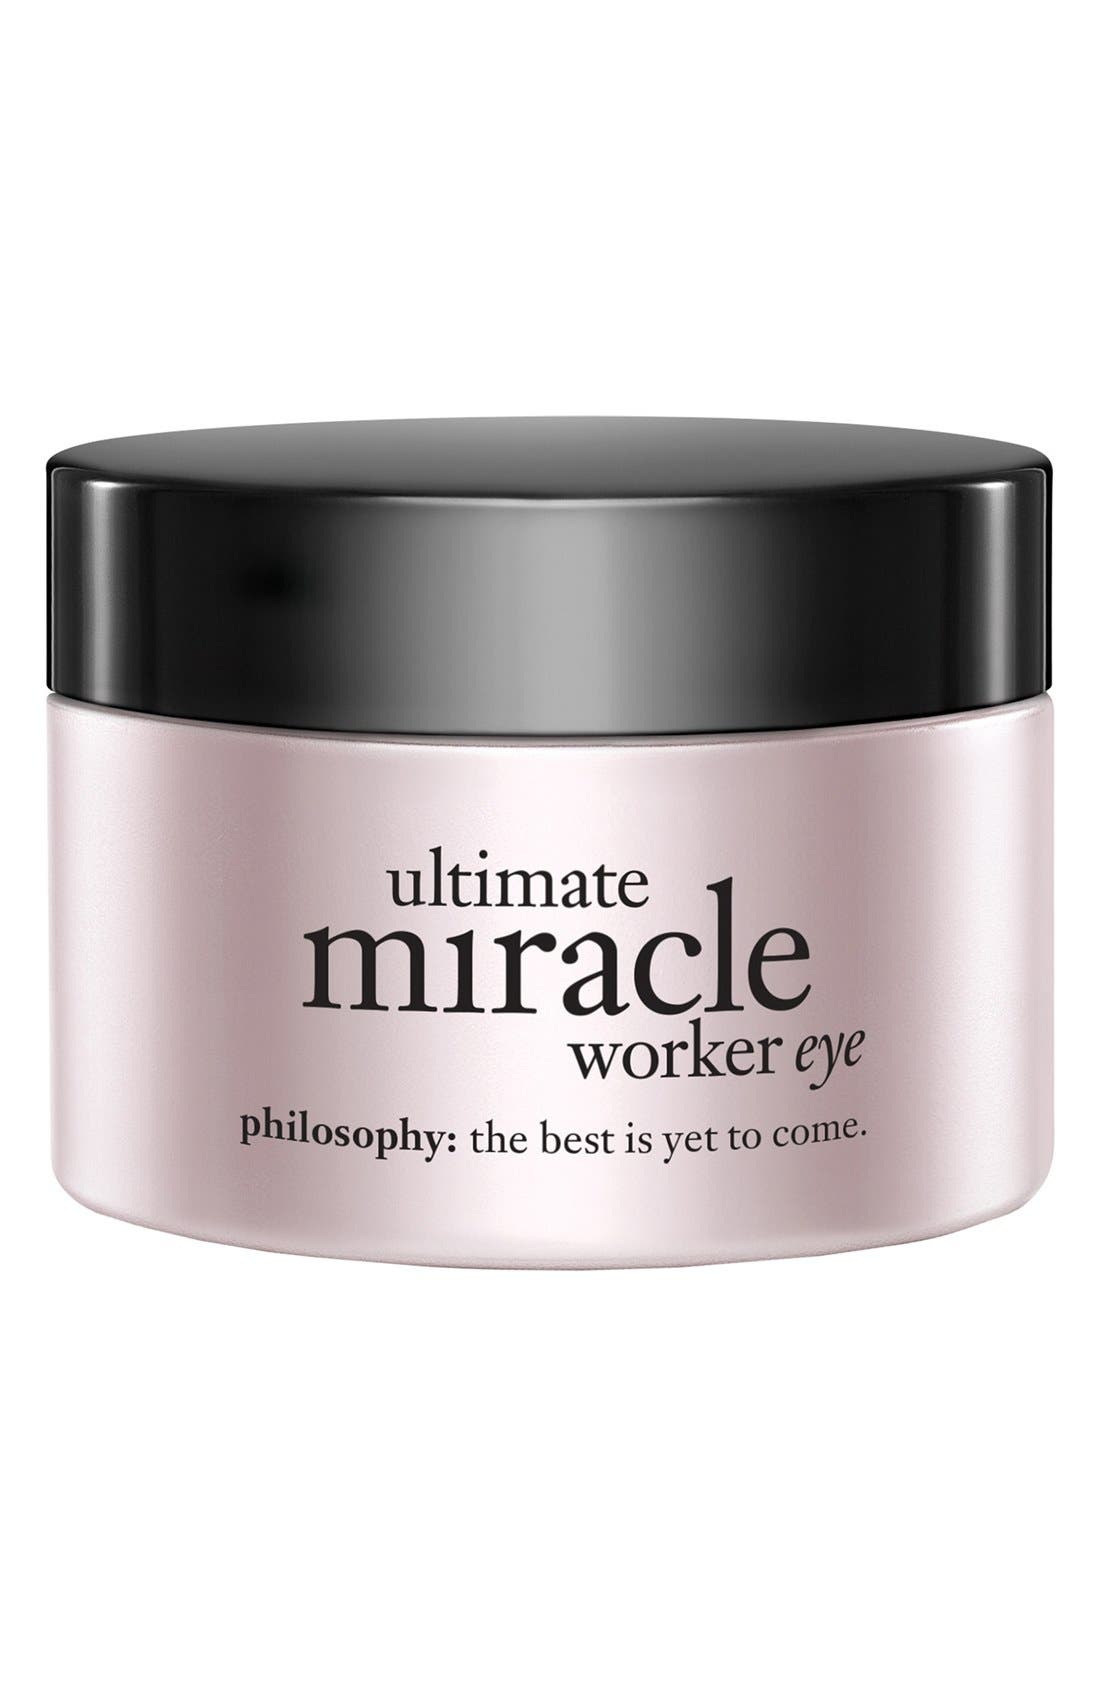 'ultimate miracle worker eye' multi-rejuvenating eye cream broad spectrum SPF 15,                             Main thumbnail 1, color,                             NO COLOR